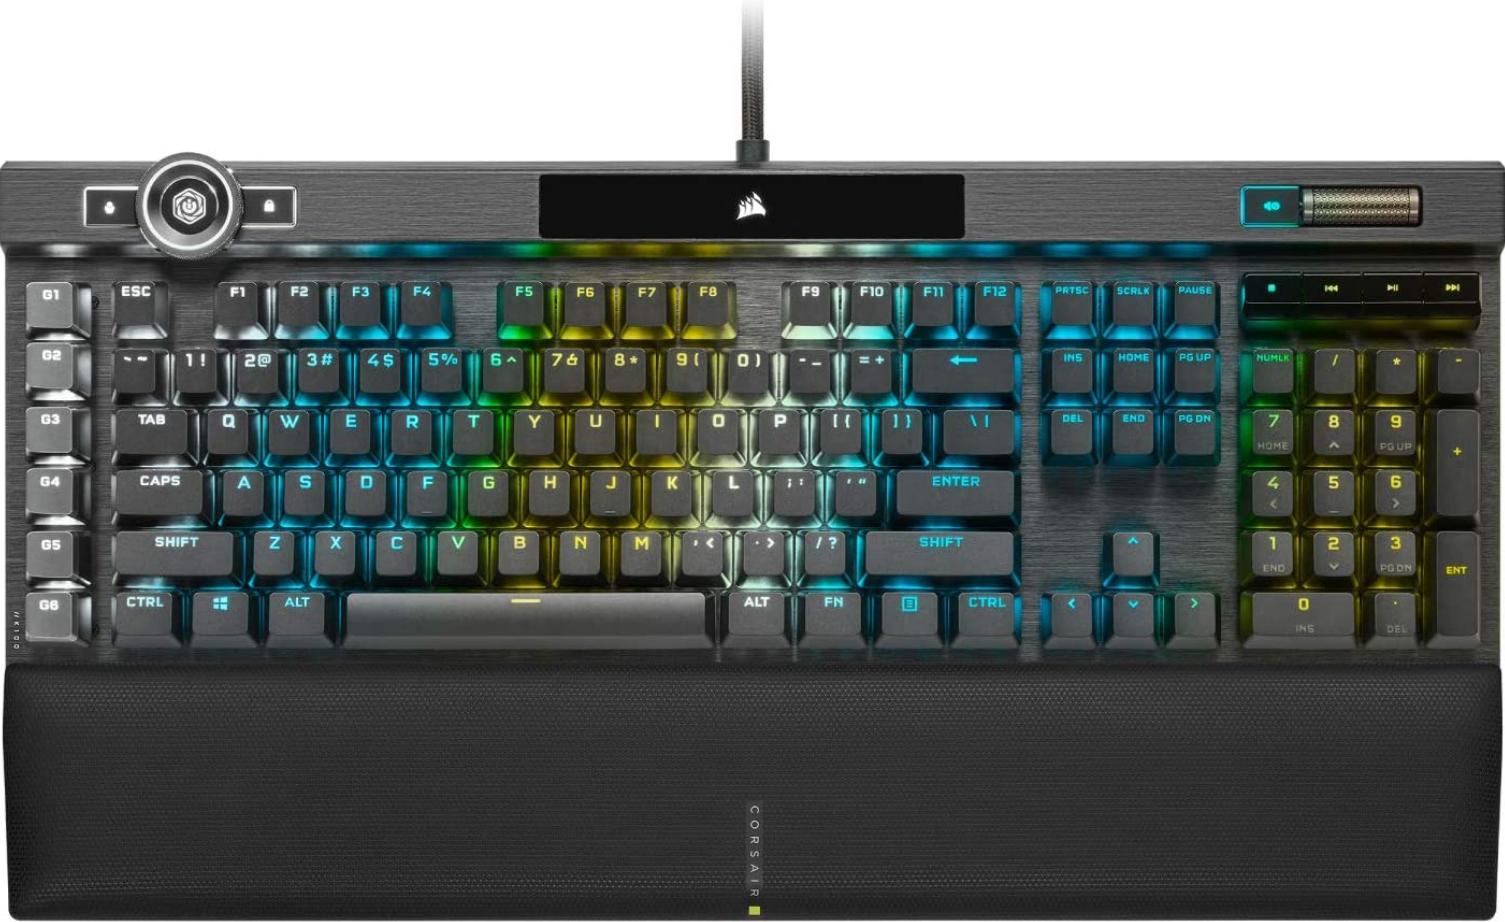 Corsair K100 Mechanical Keyboard with RGB lighting